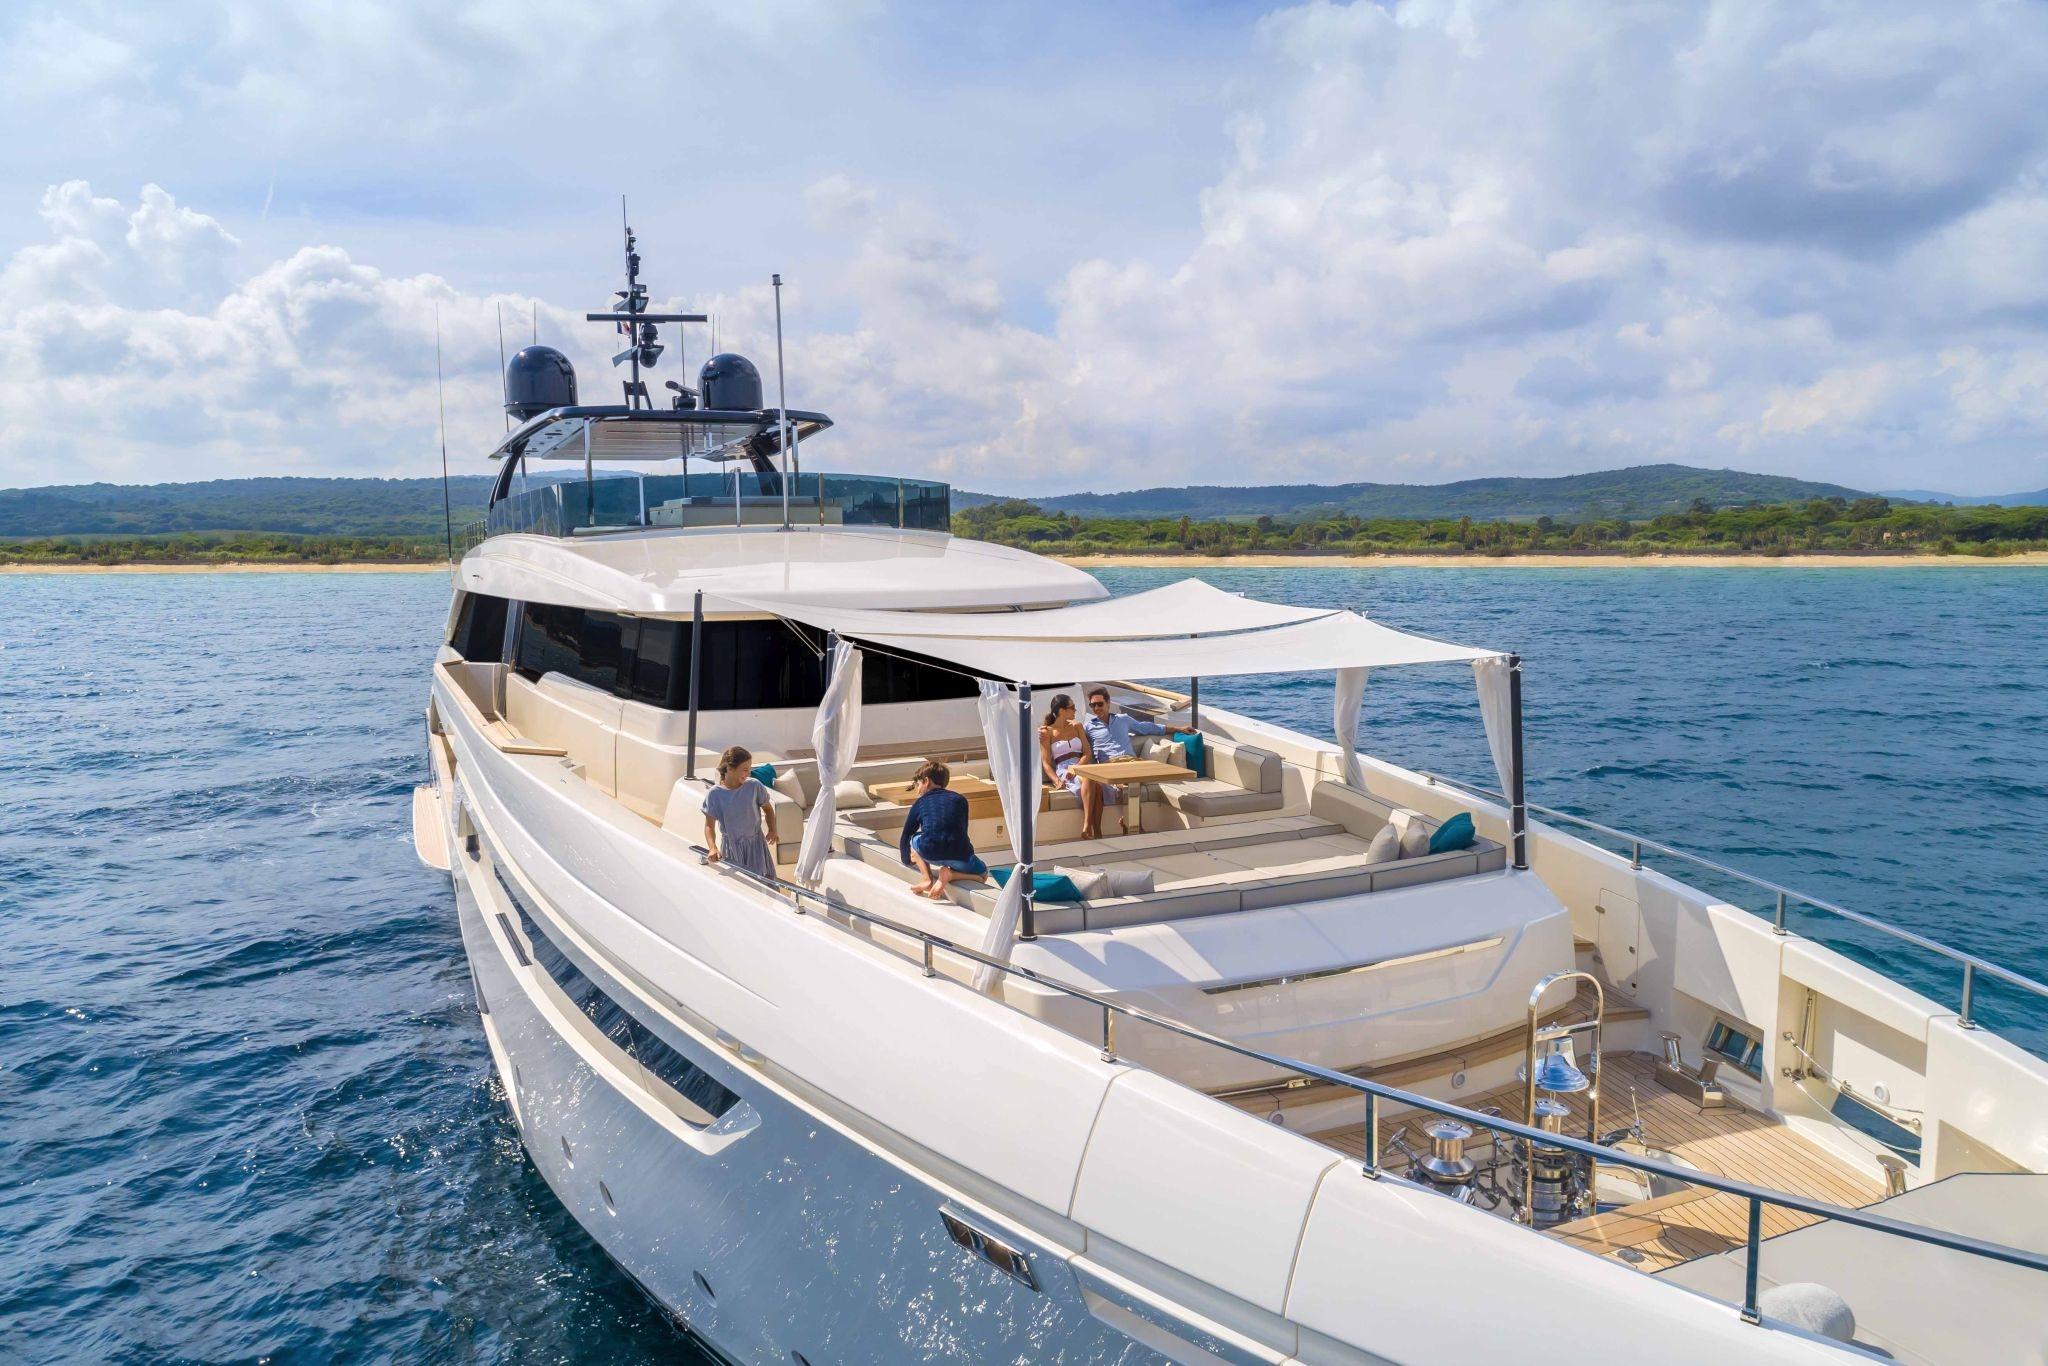 Alquiler de yates de lujo. Alquiler de barcos baratos en Ibiza. Barcos baratos de alquiler en Ibiza